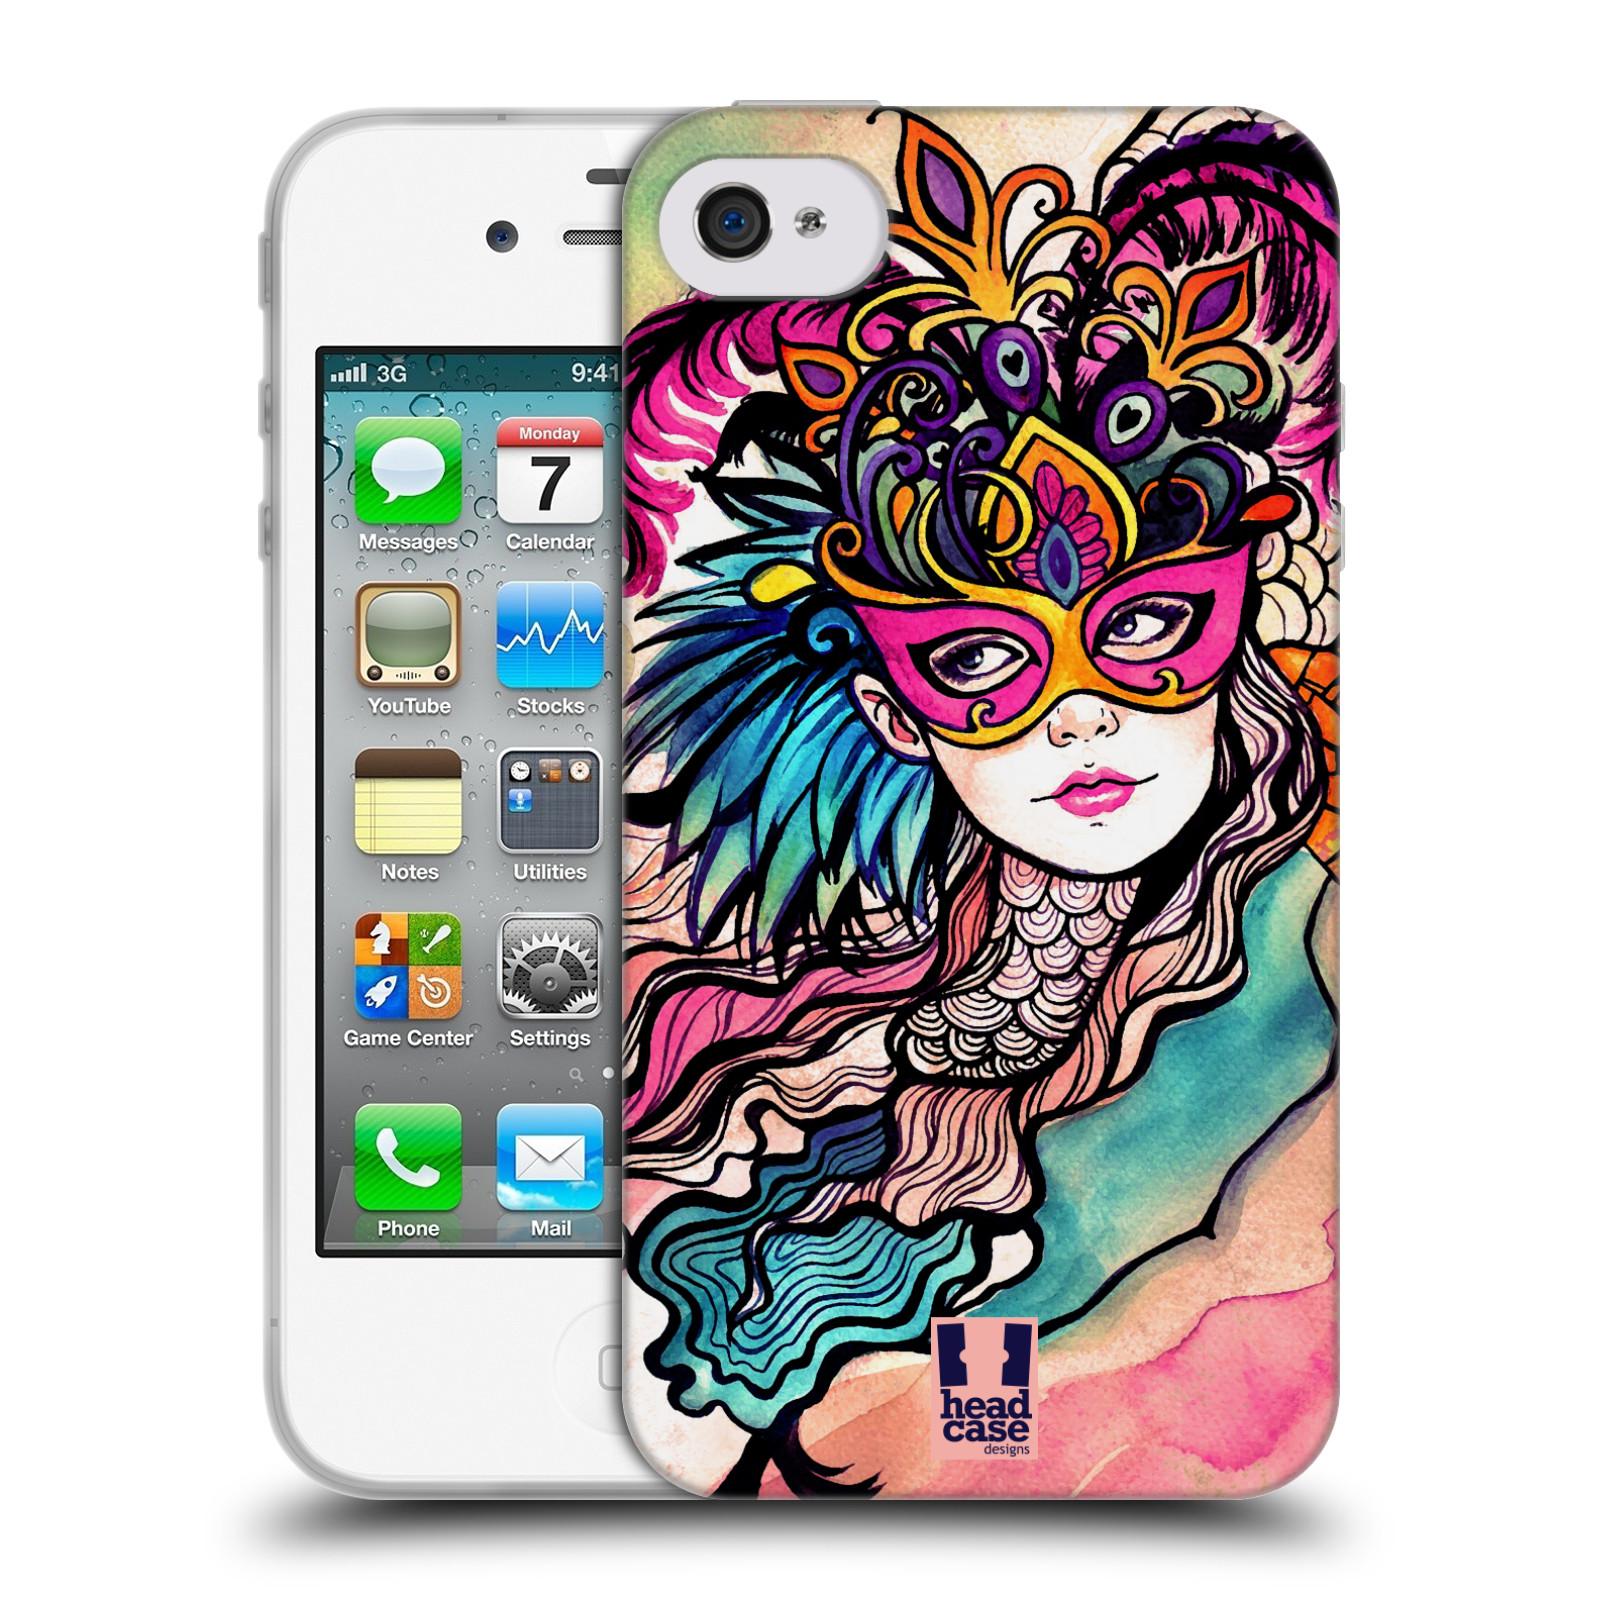 HEAD CASE silikonový obal na mobil Apple Iphone 4/4S vzor Maškarní ples masky kreslené vzory růžová